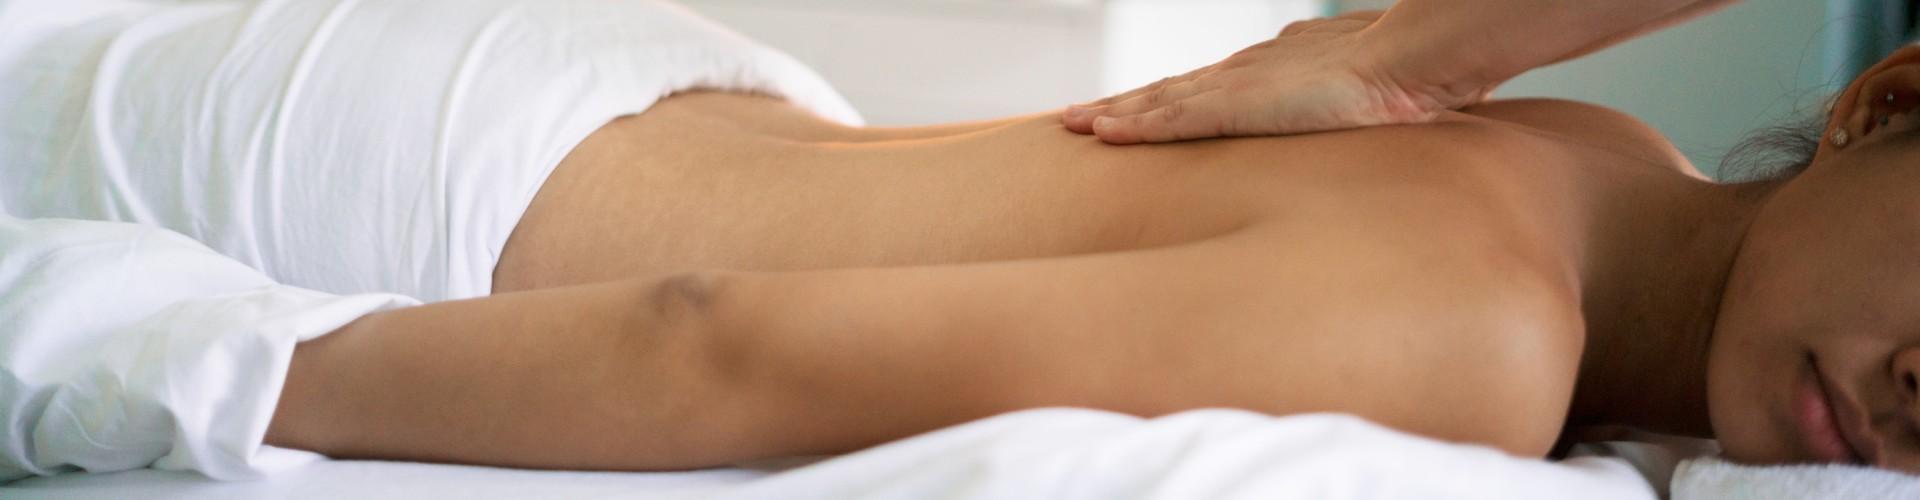 vrouw op massagetafel start